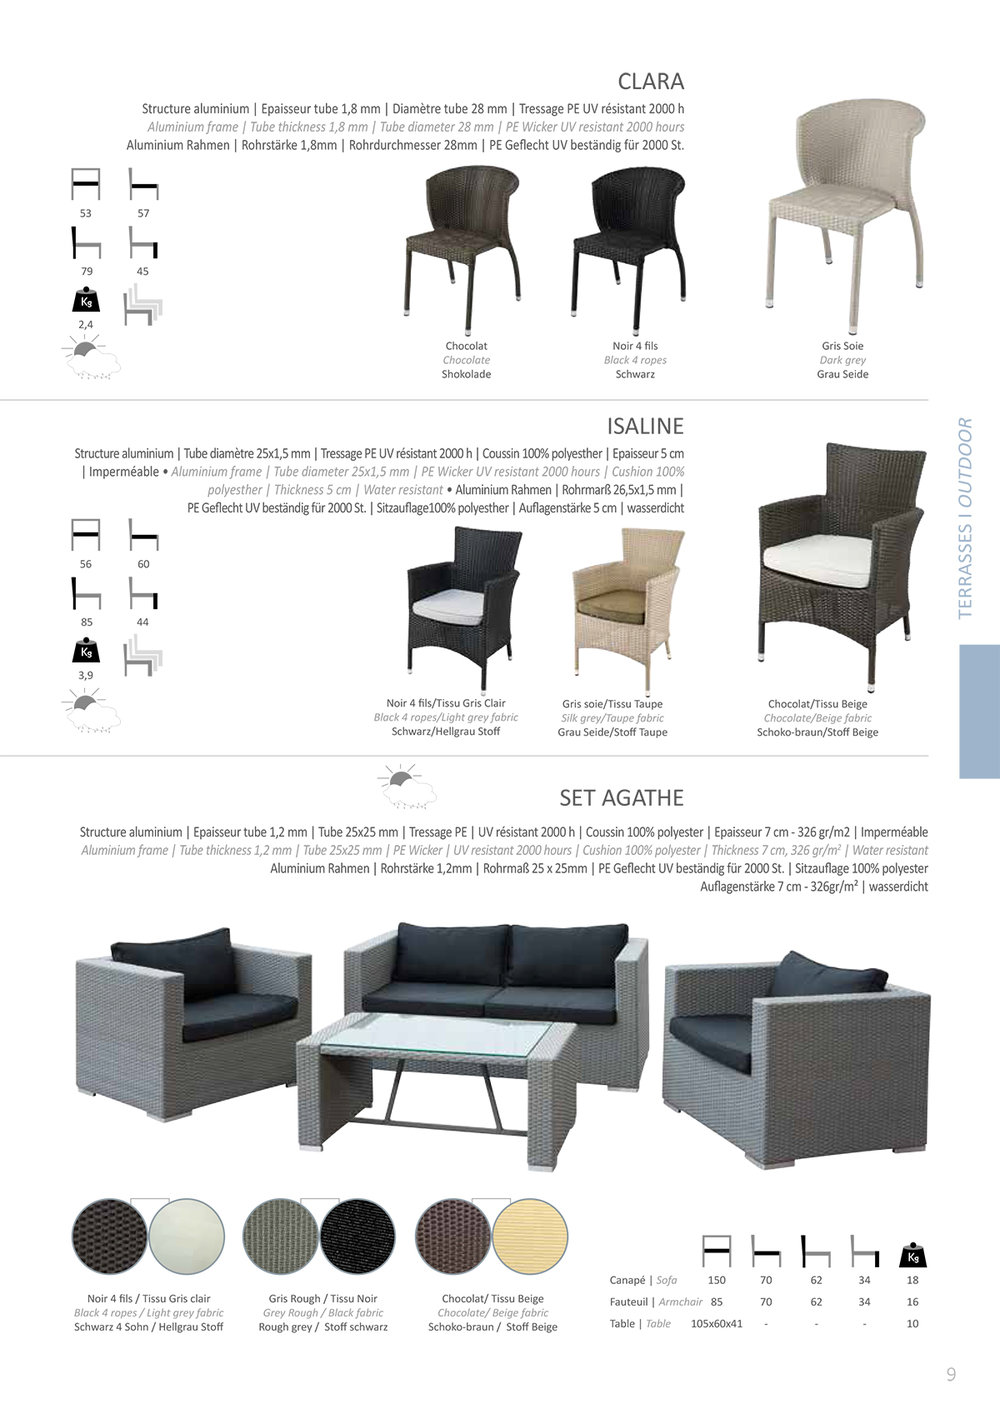 Catalogue-be-Express-2018-9.jpg